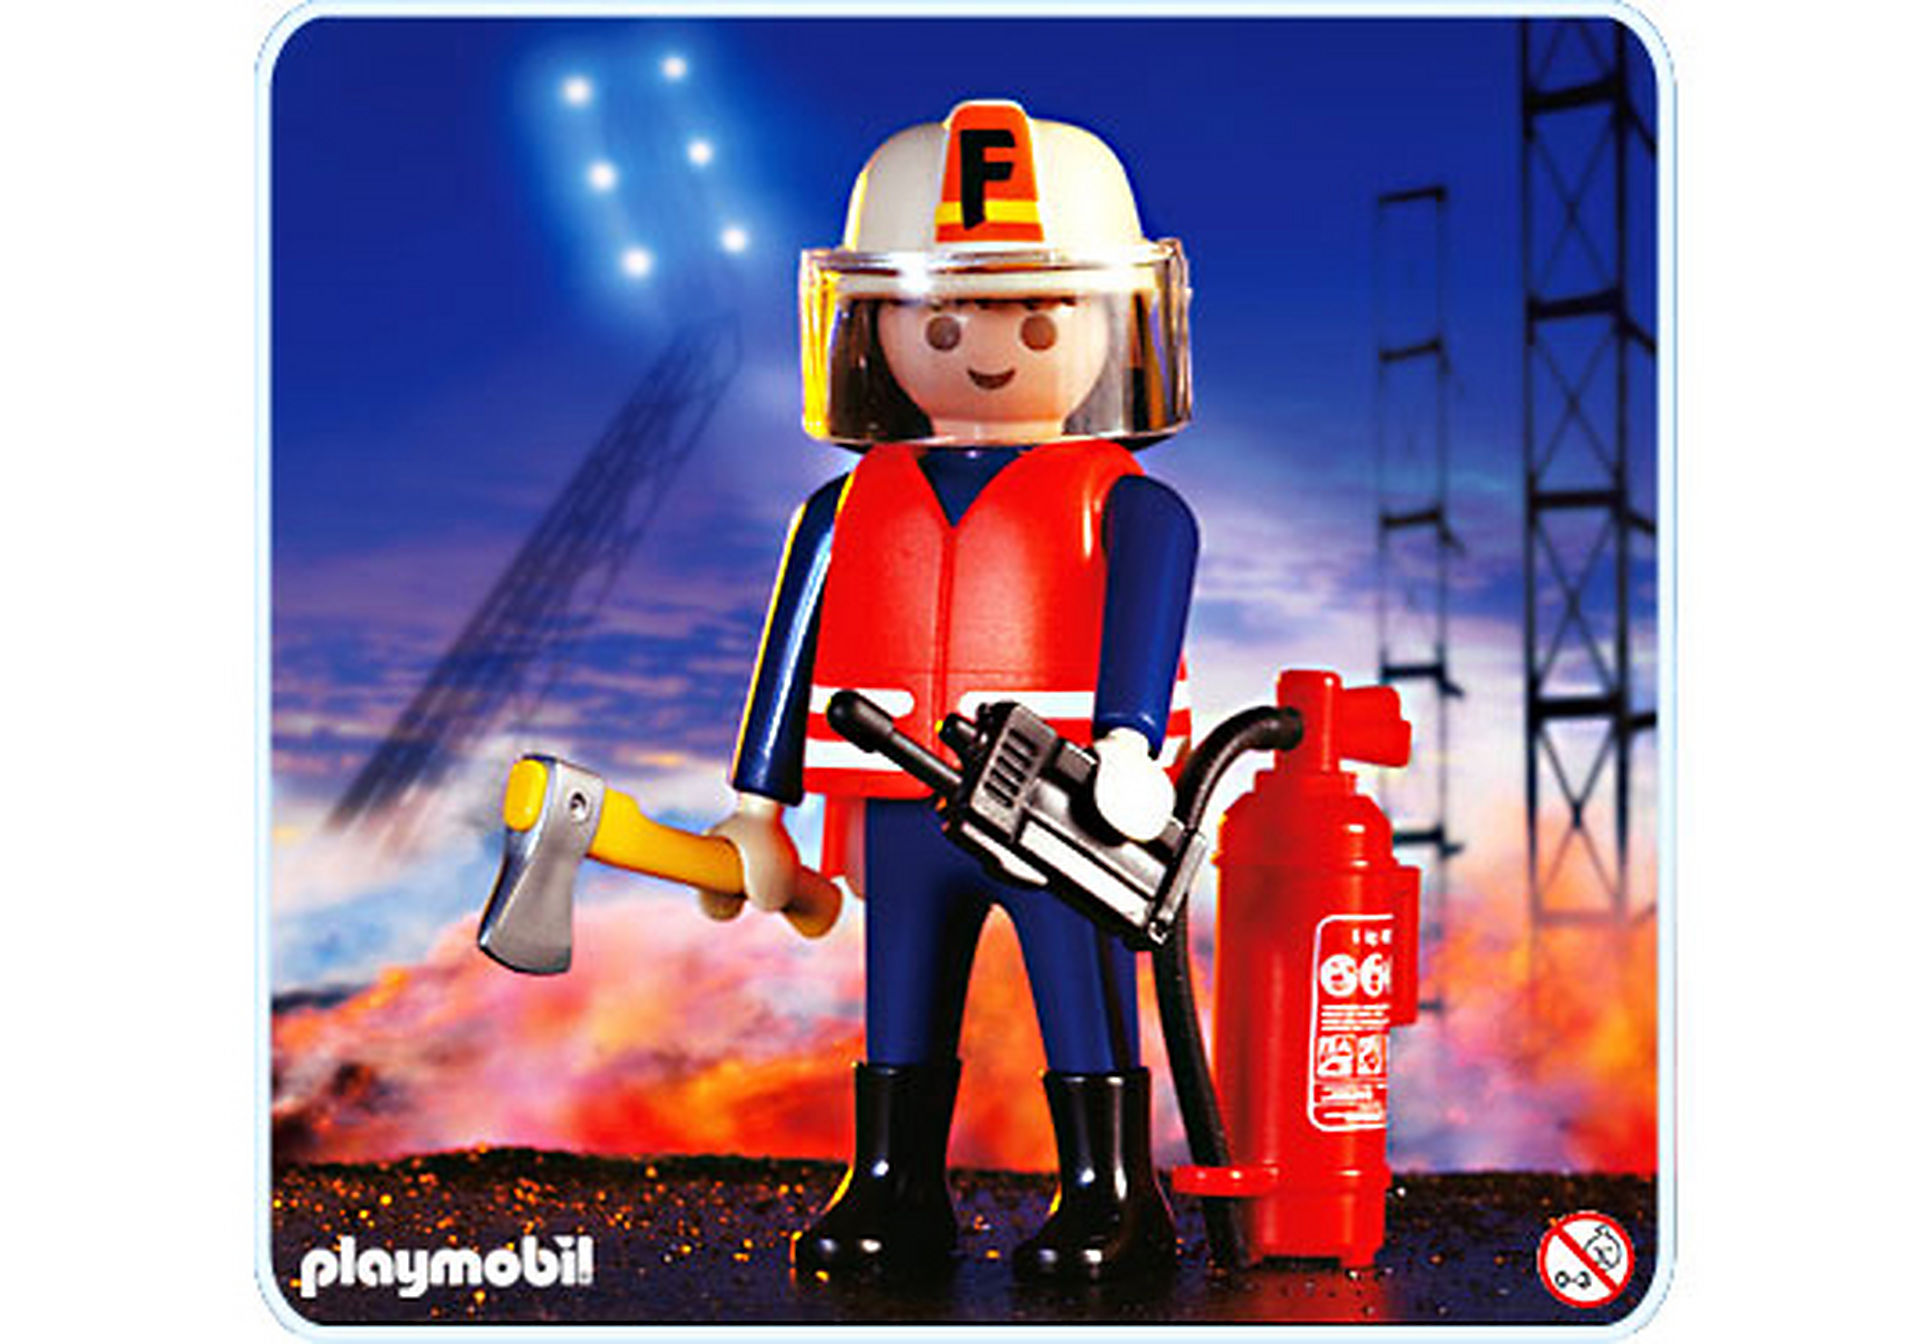 http://media.playmobil.com/i/playmobil/4578-A_product_detail/Feuerwehrmann